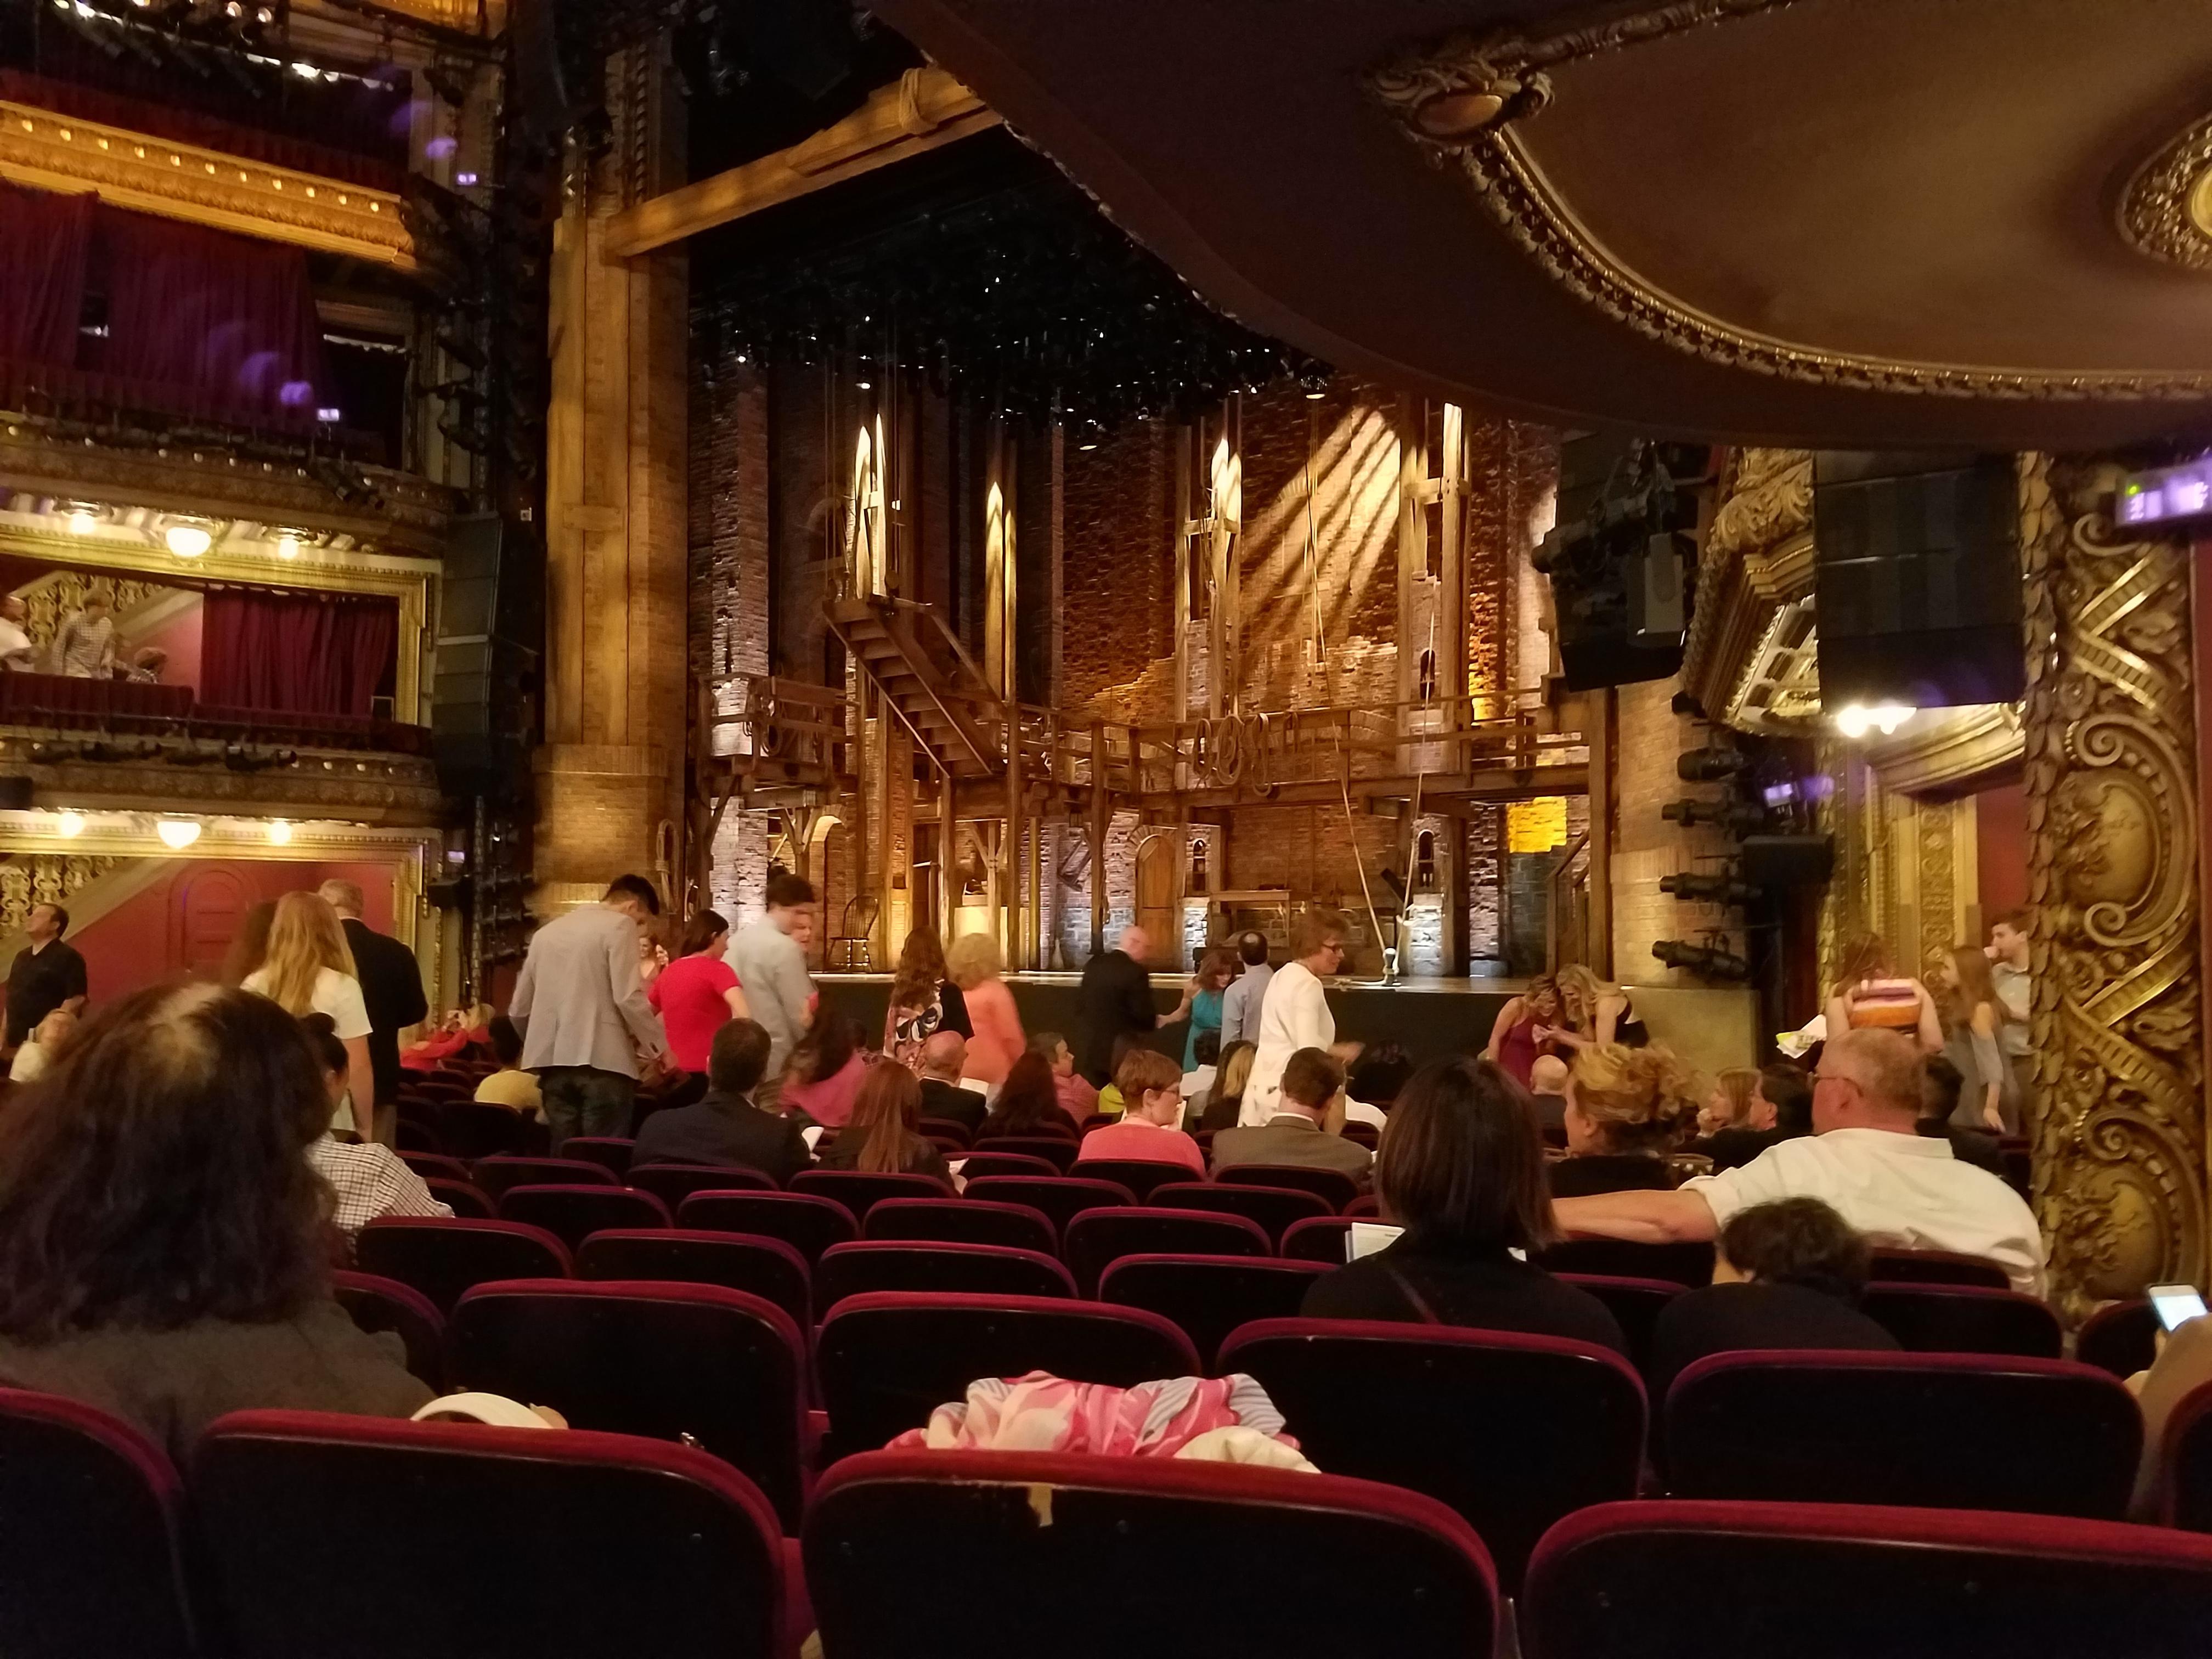 CIBC Theatre Section Orchestra R Row Q Seat 20